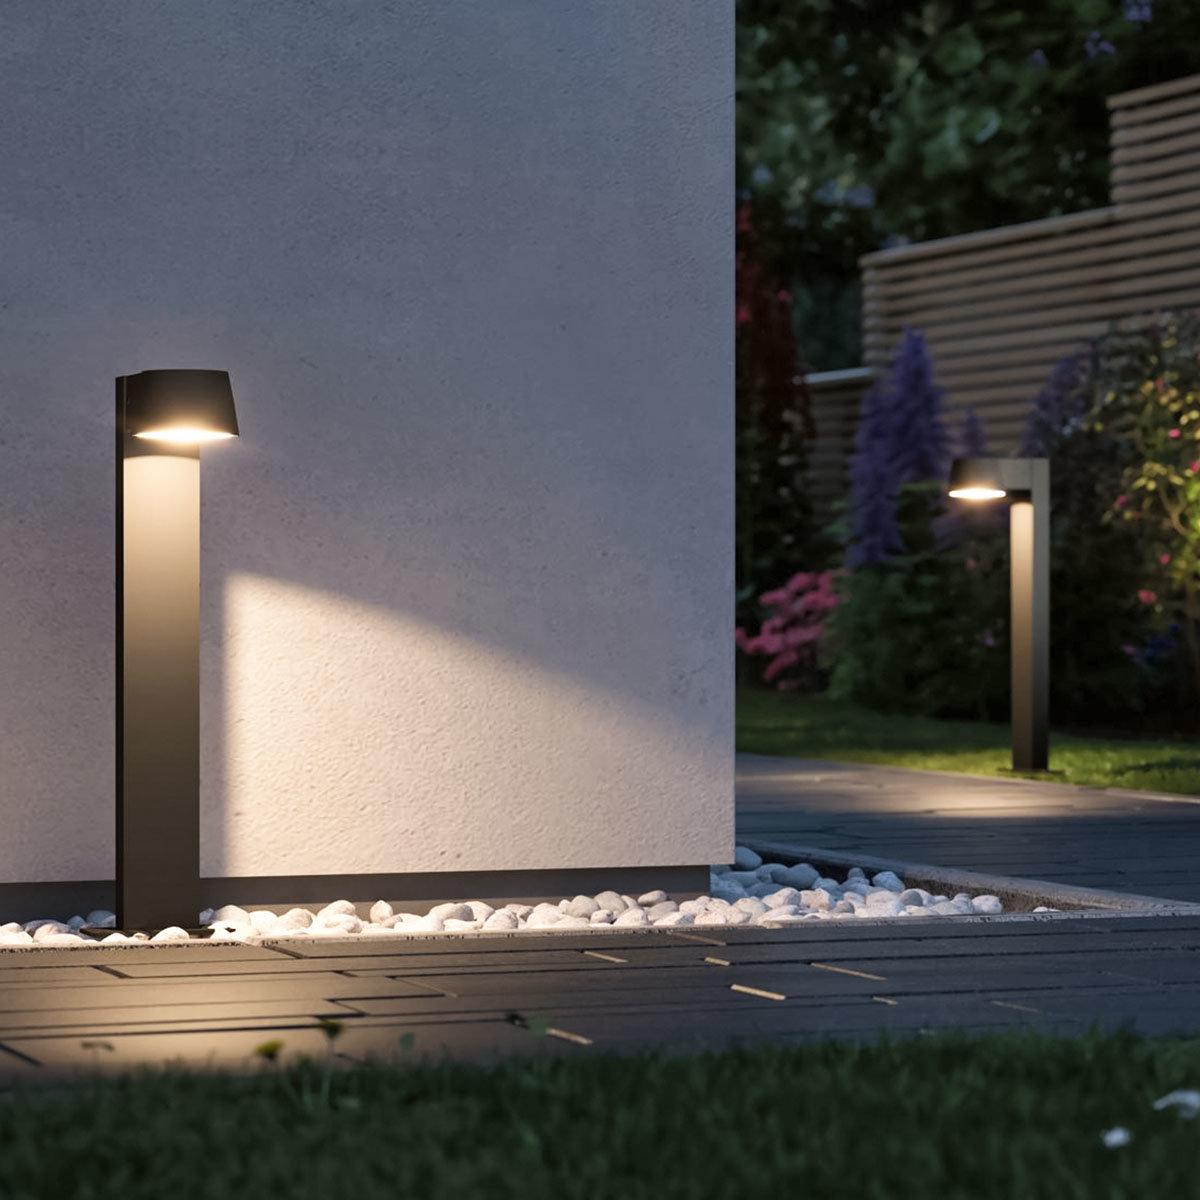 LED Outdoor Pollerleuchte Capea, 3000K 6W 230V IP44,  Alu, schwarz